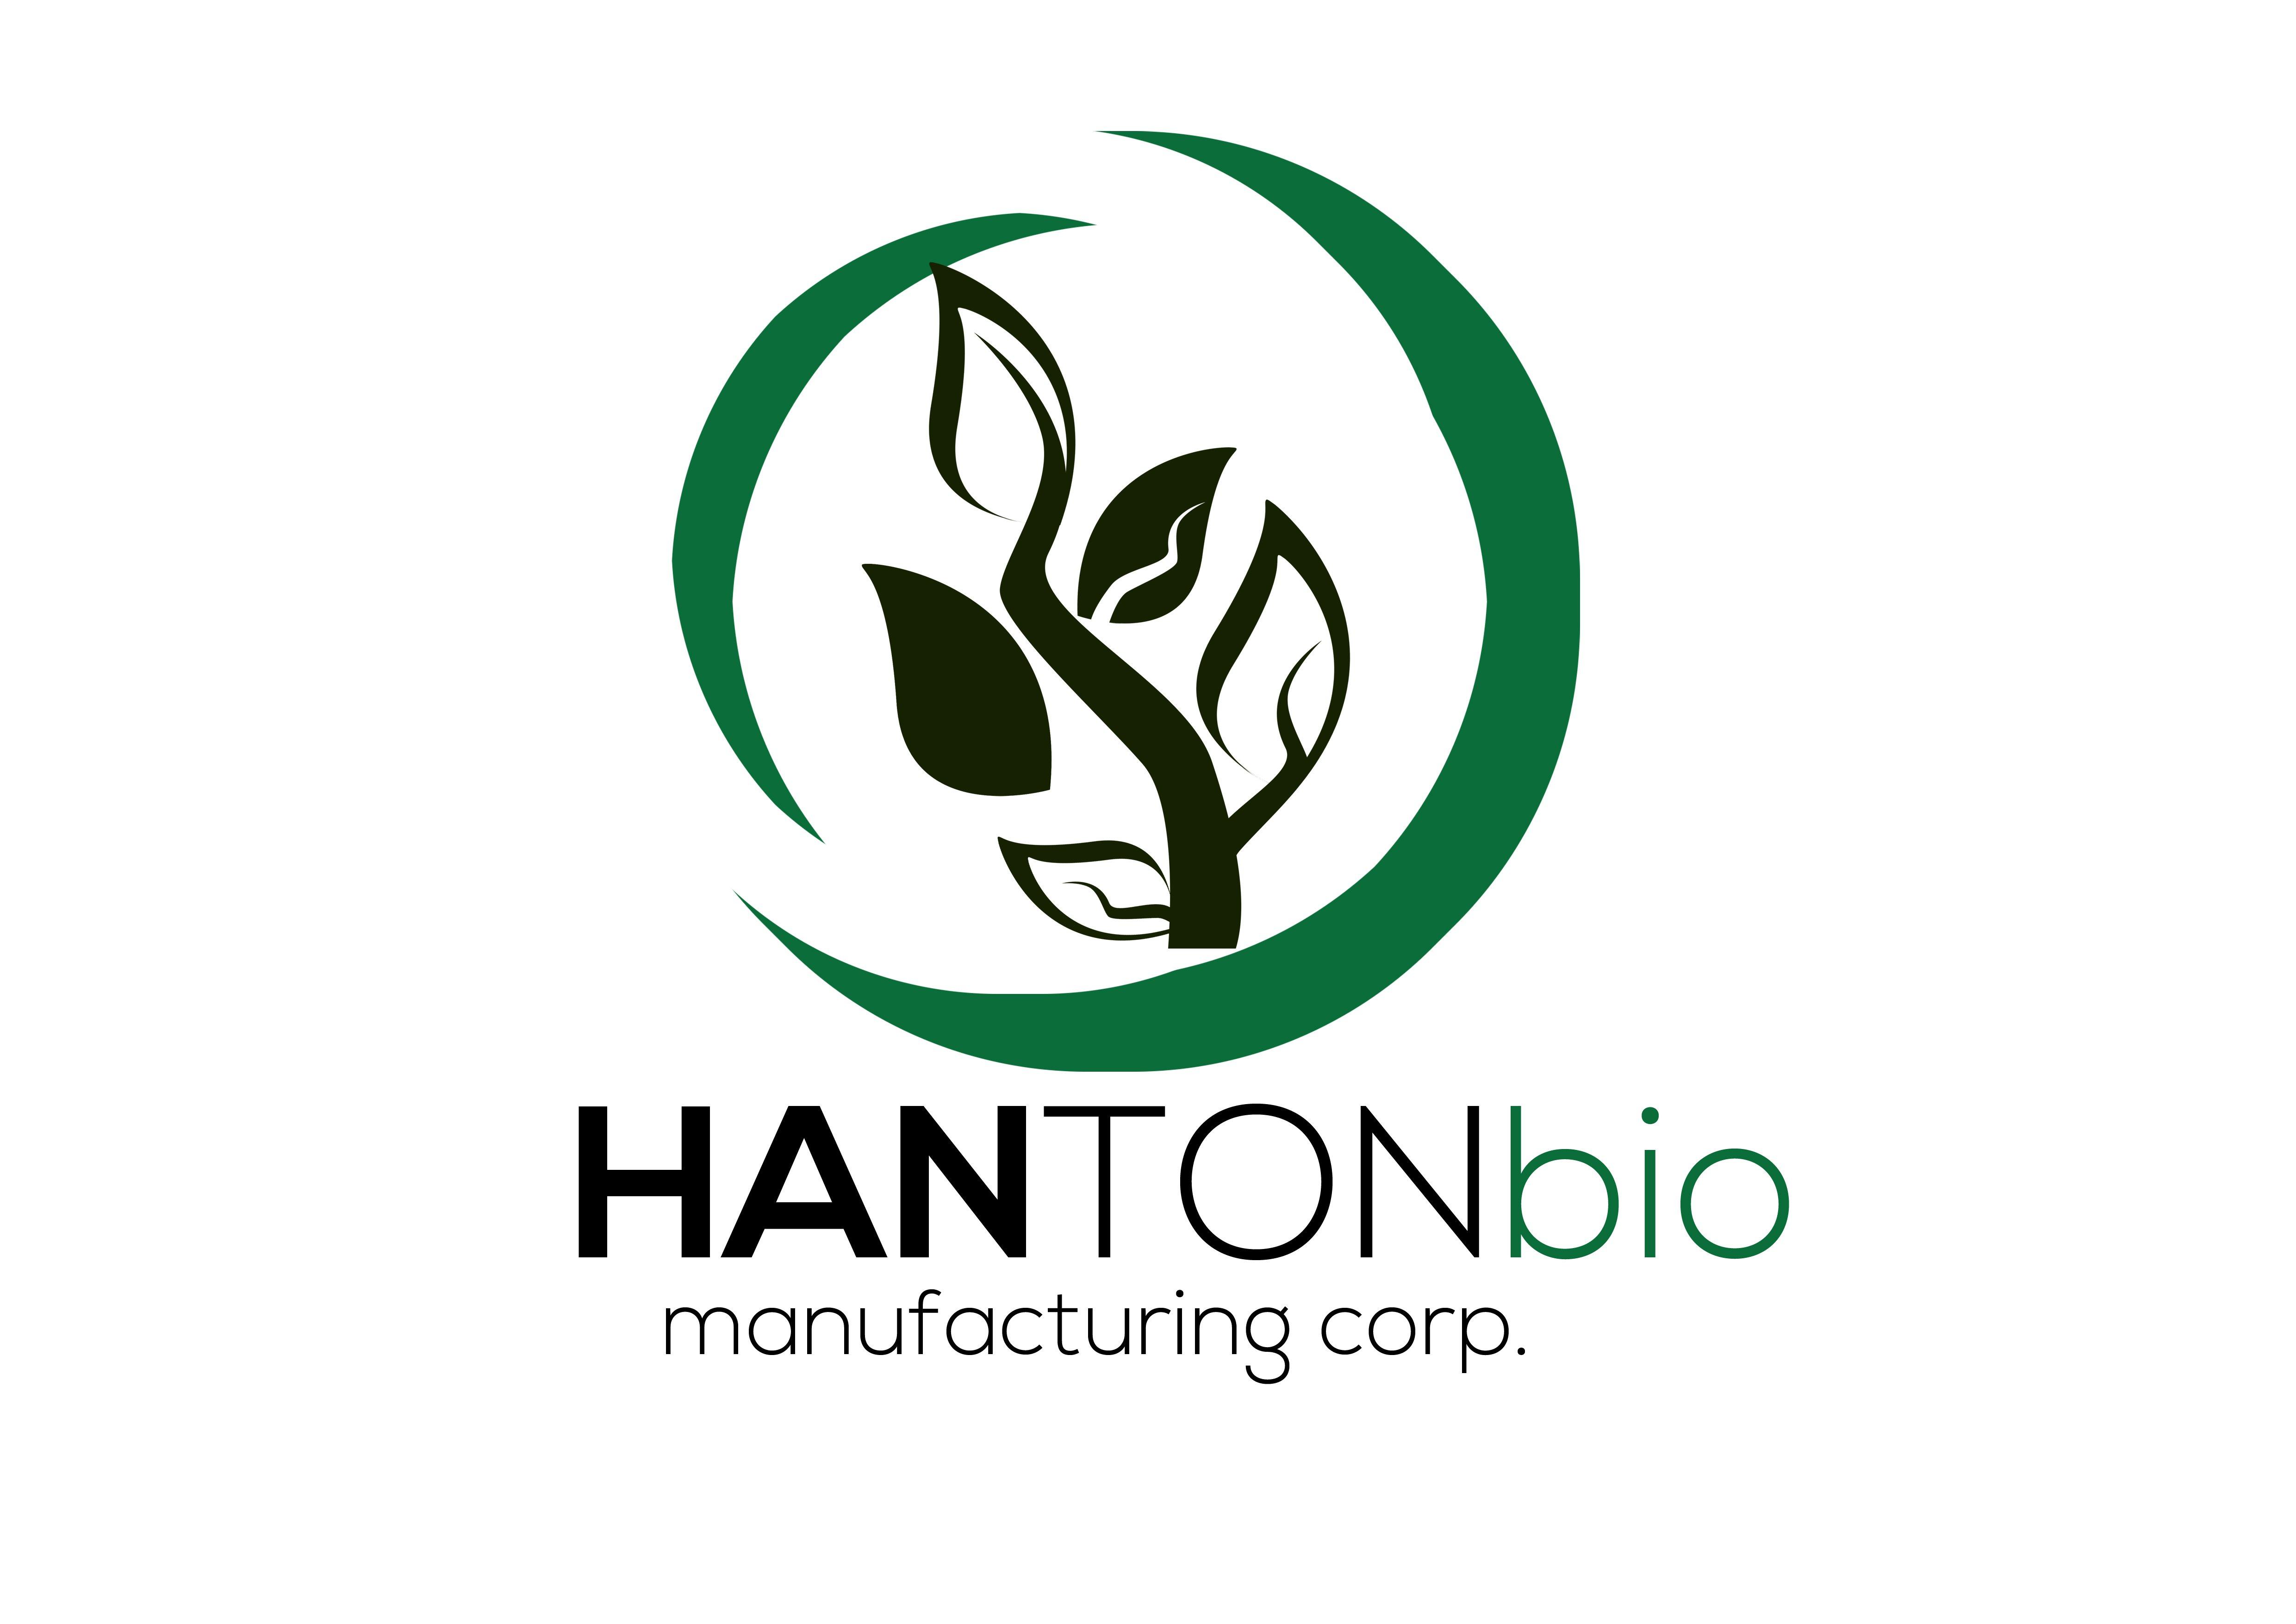 Hanton Bio Manufacturing Corp.